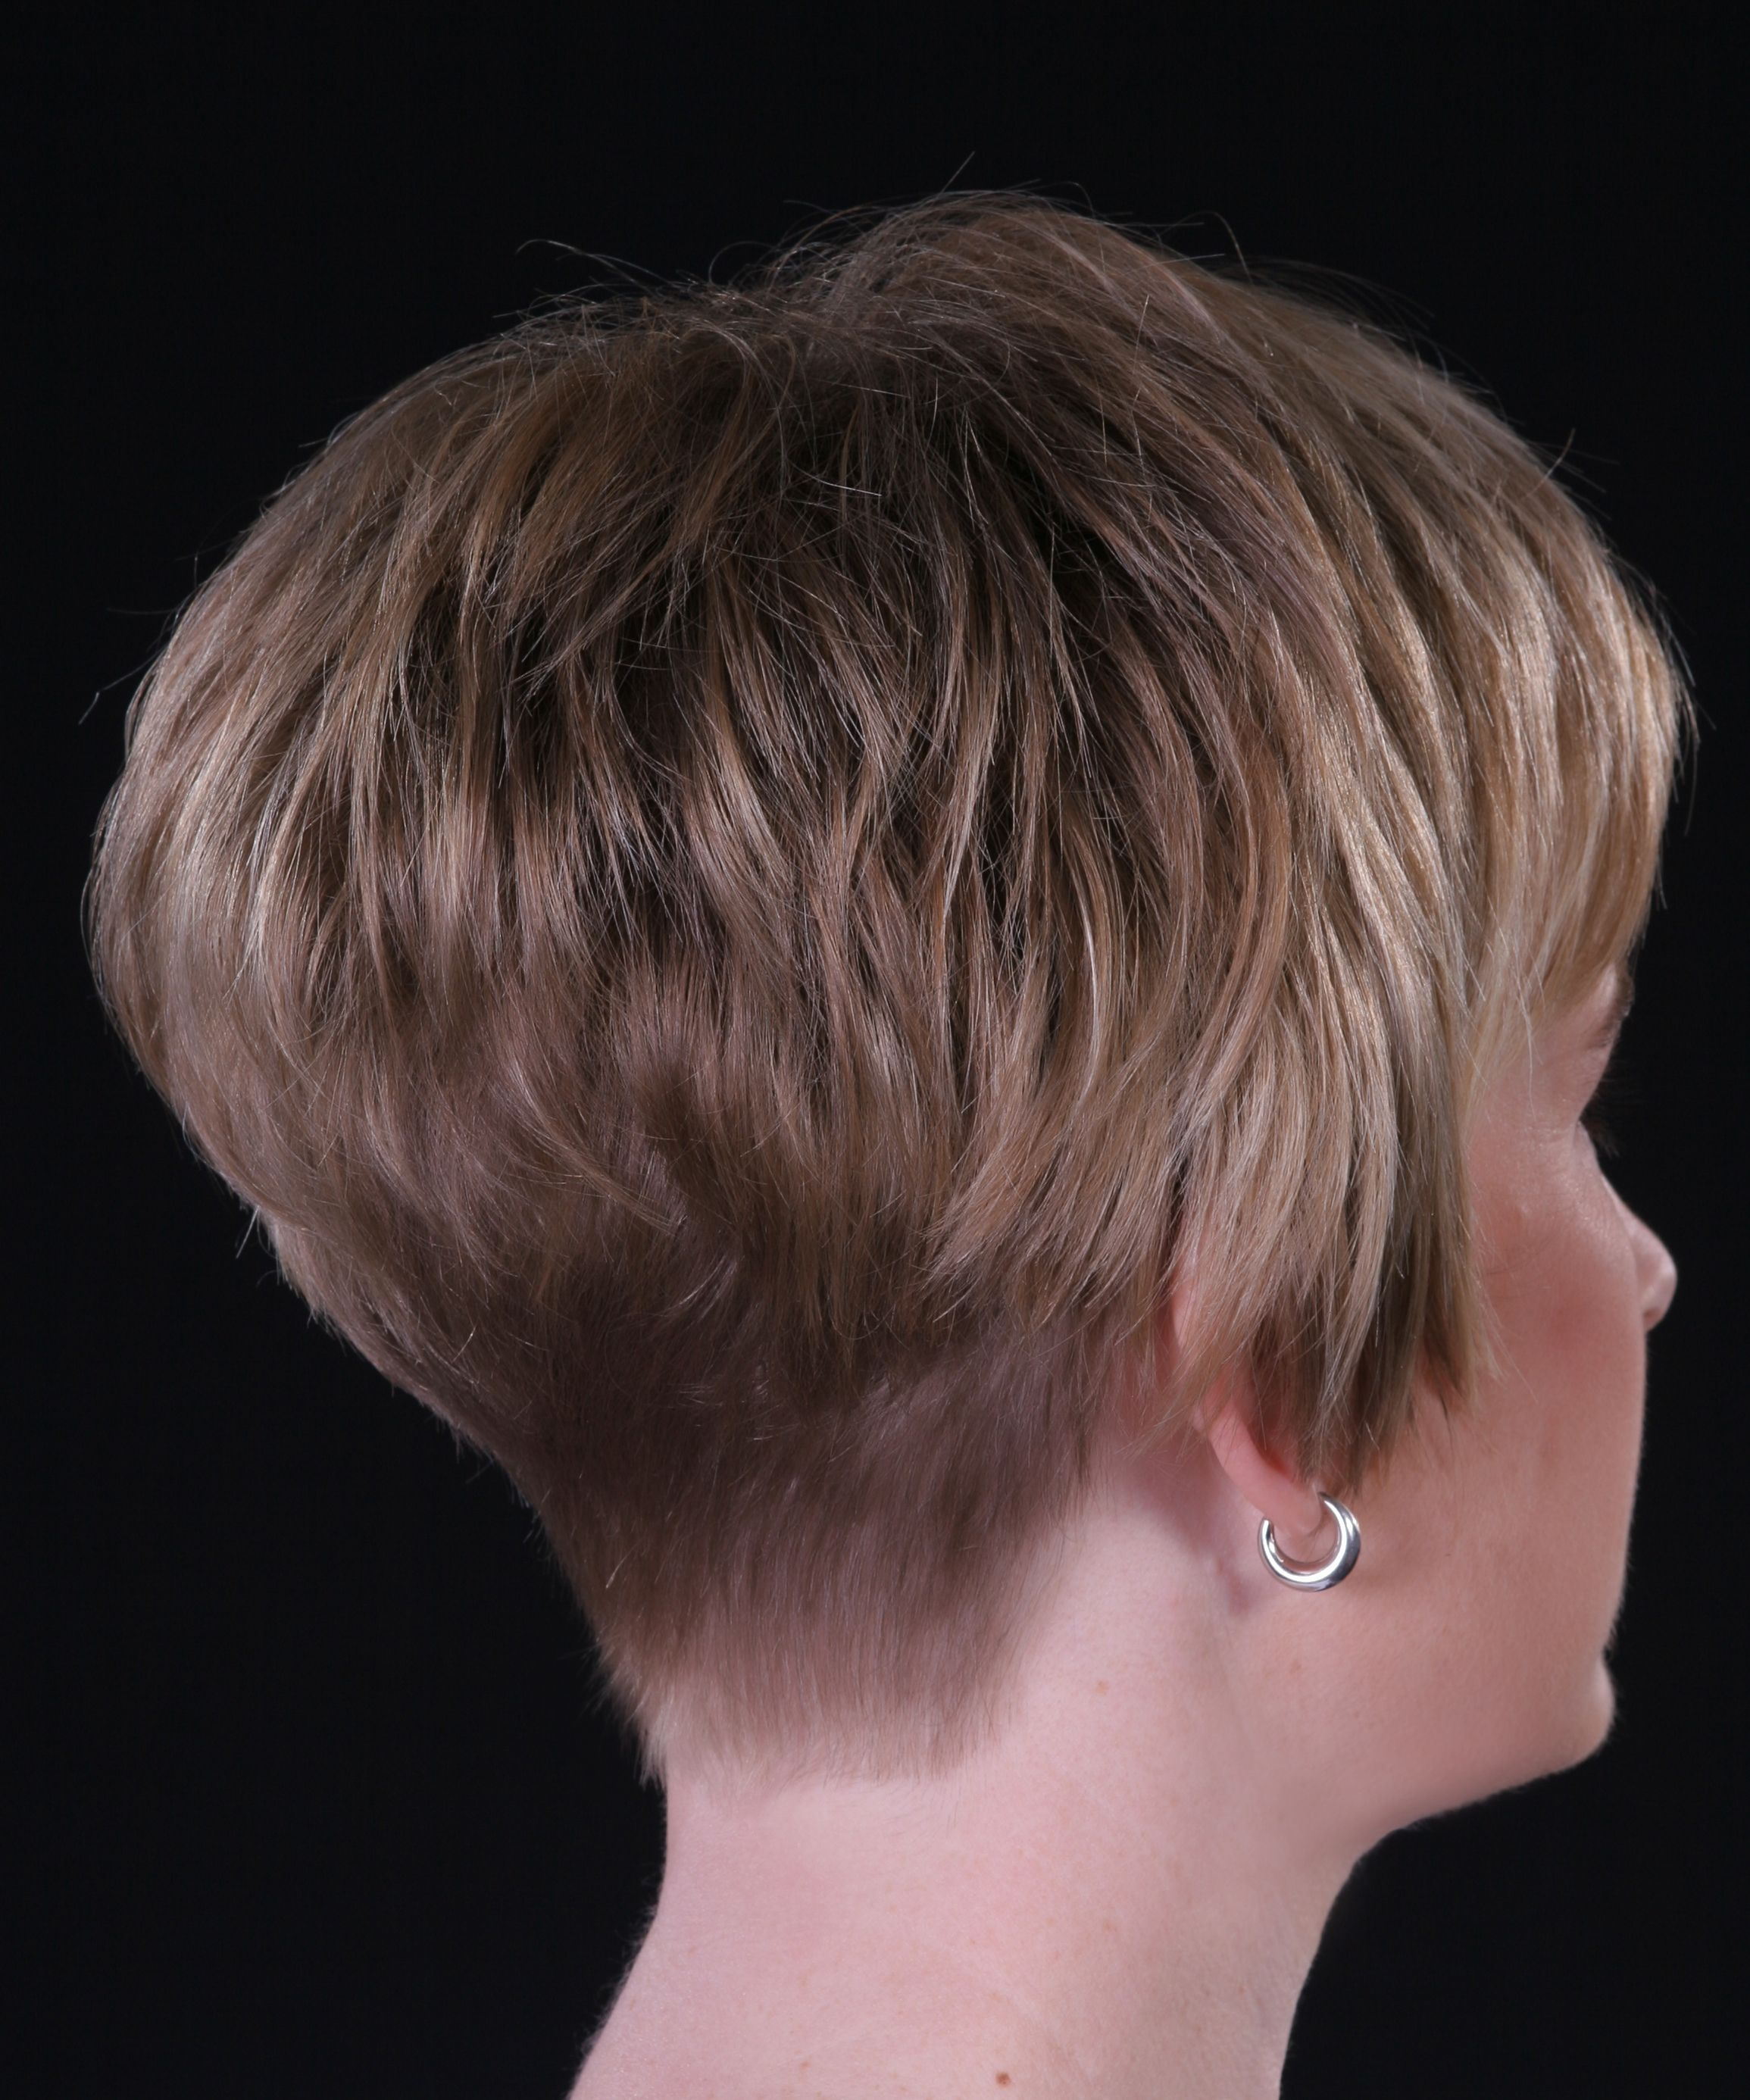 Swell Short Wedge Cut Artana Shear Xpectations Artanas Work Hairstyles For Women Draintrainus